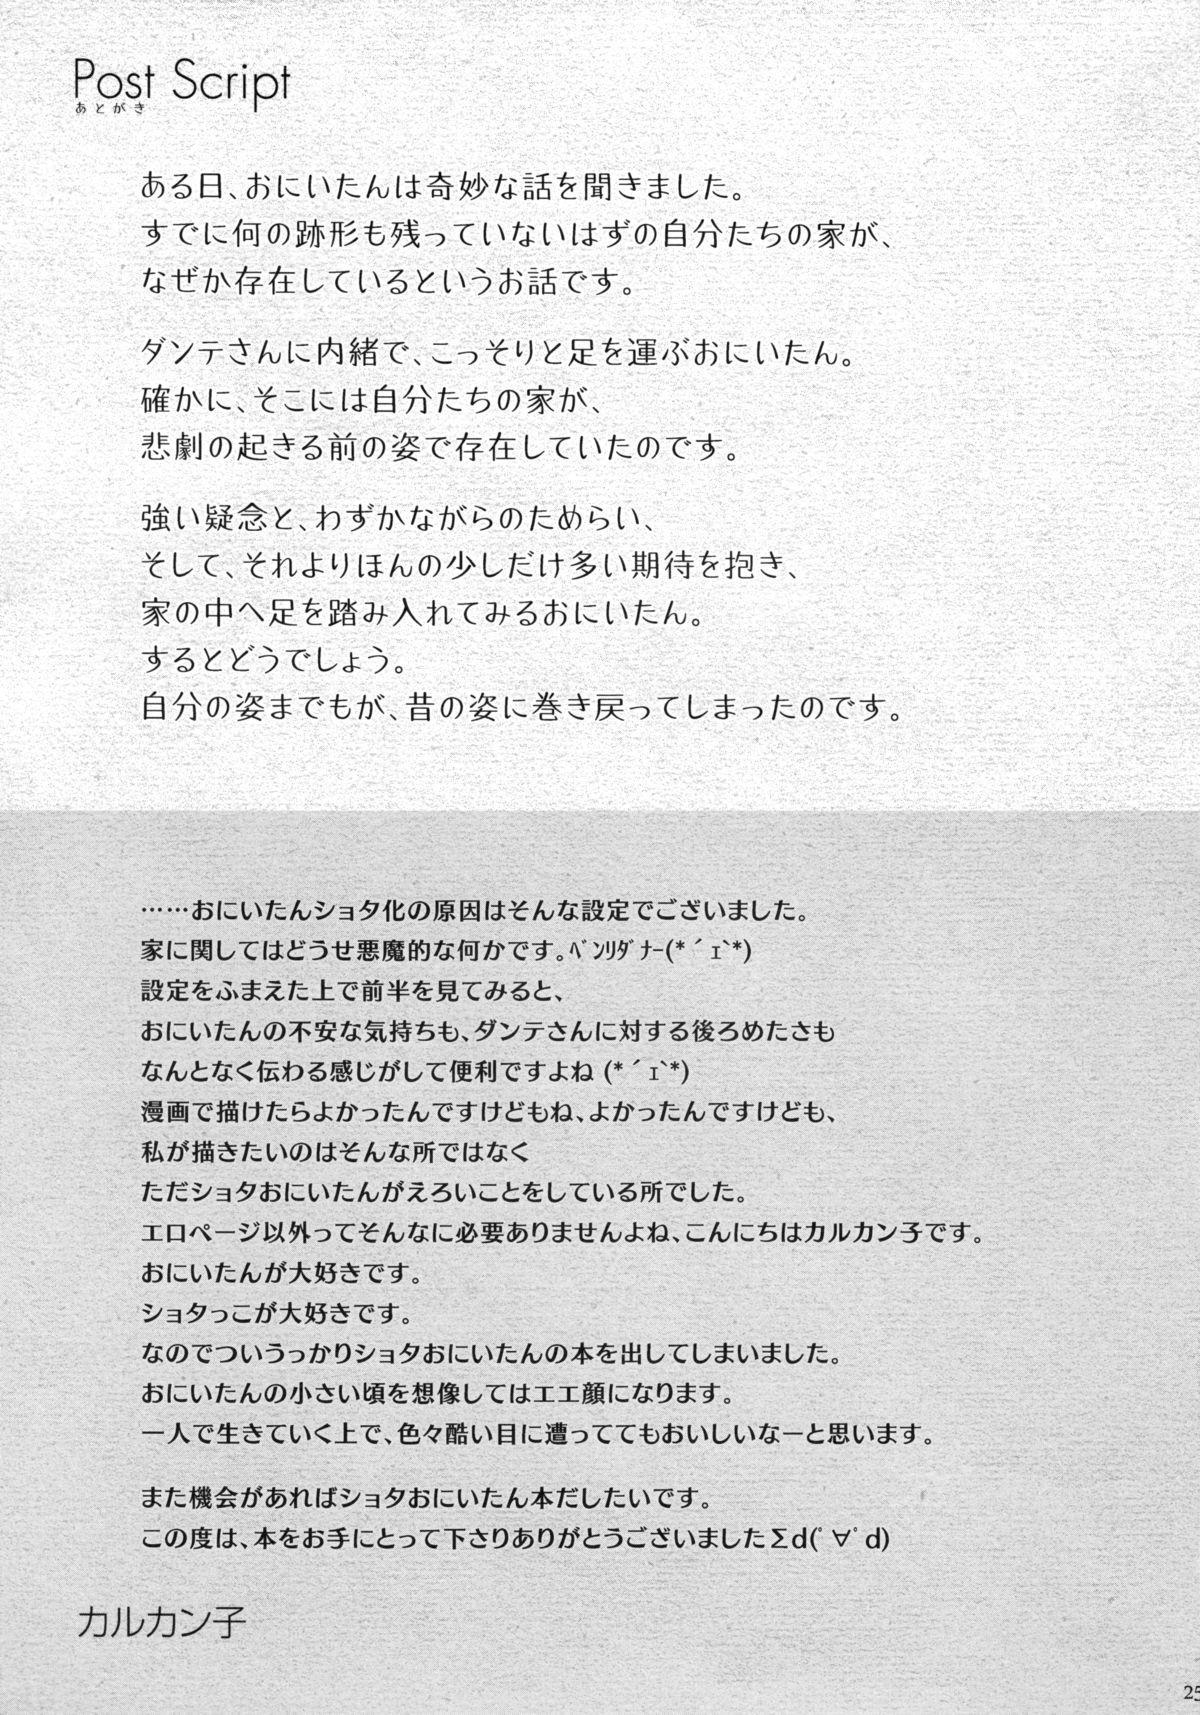 Ore no Aniki ga Naze daka Totsuzen Chicchaku Natte Shimattan daga. | My Older Brother Suddenly Shrank for Some Reason 23